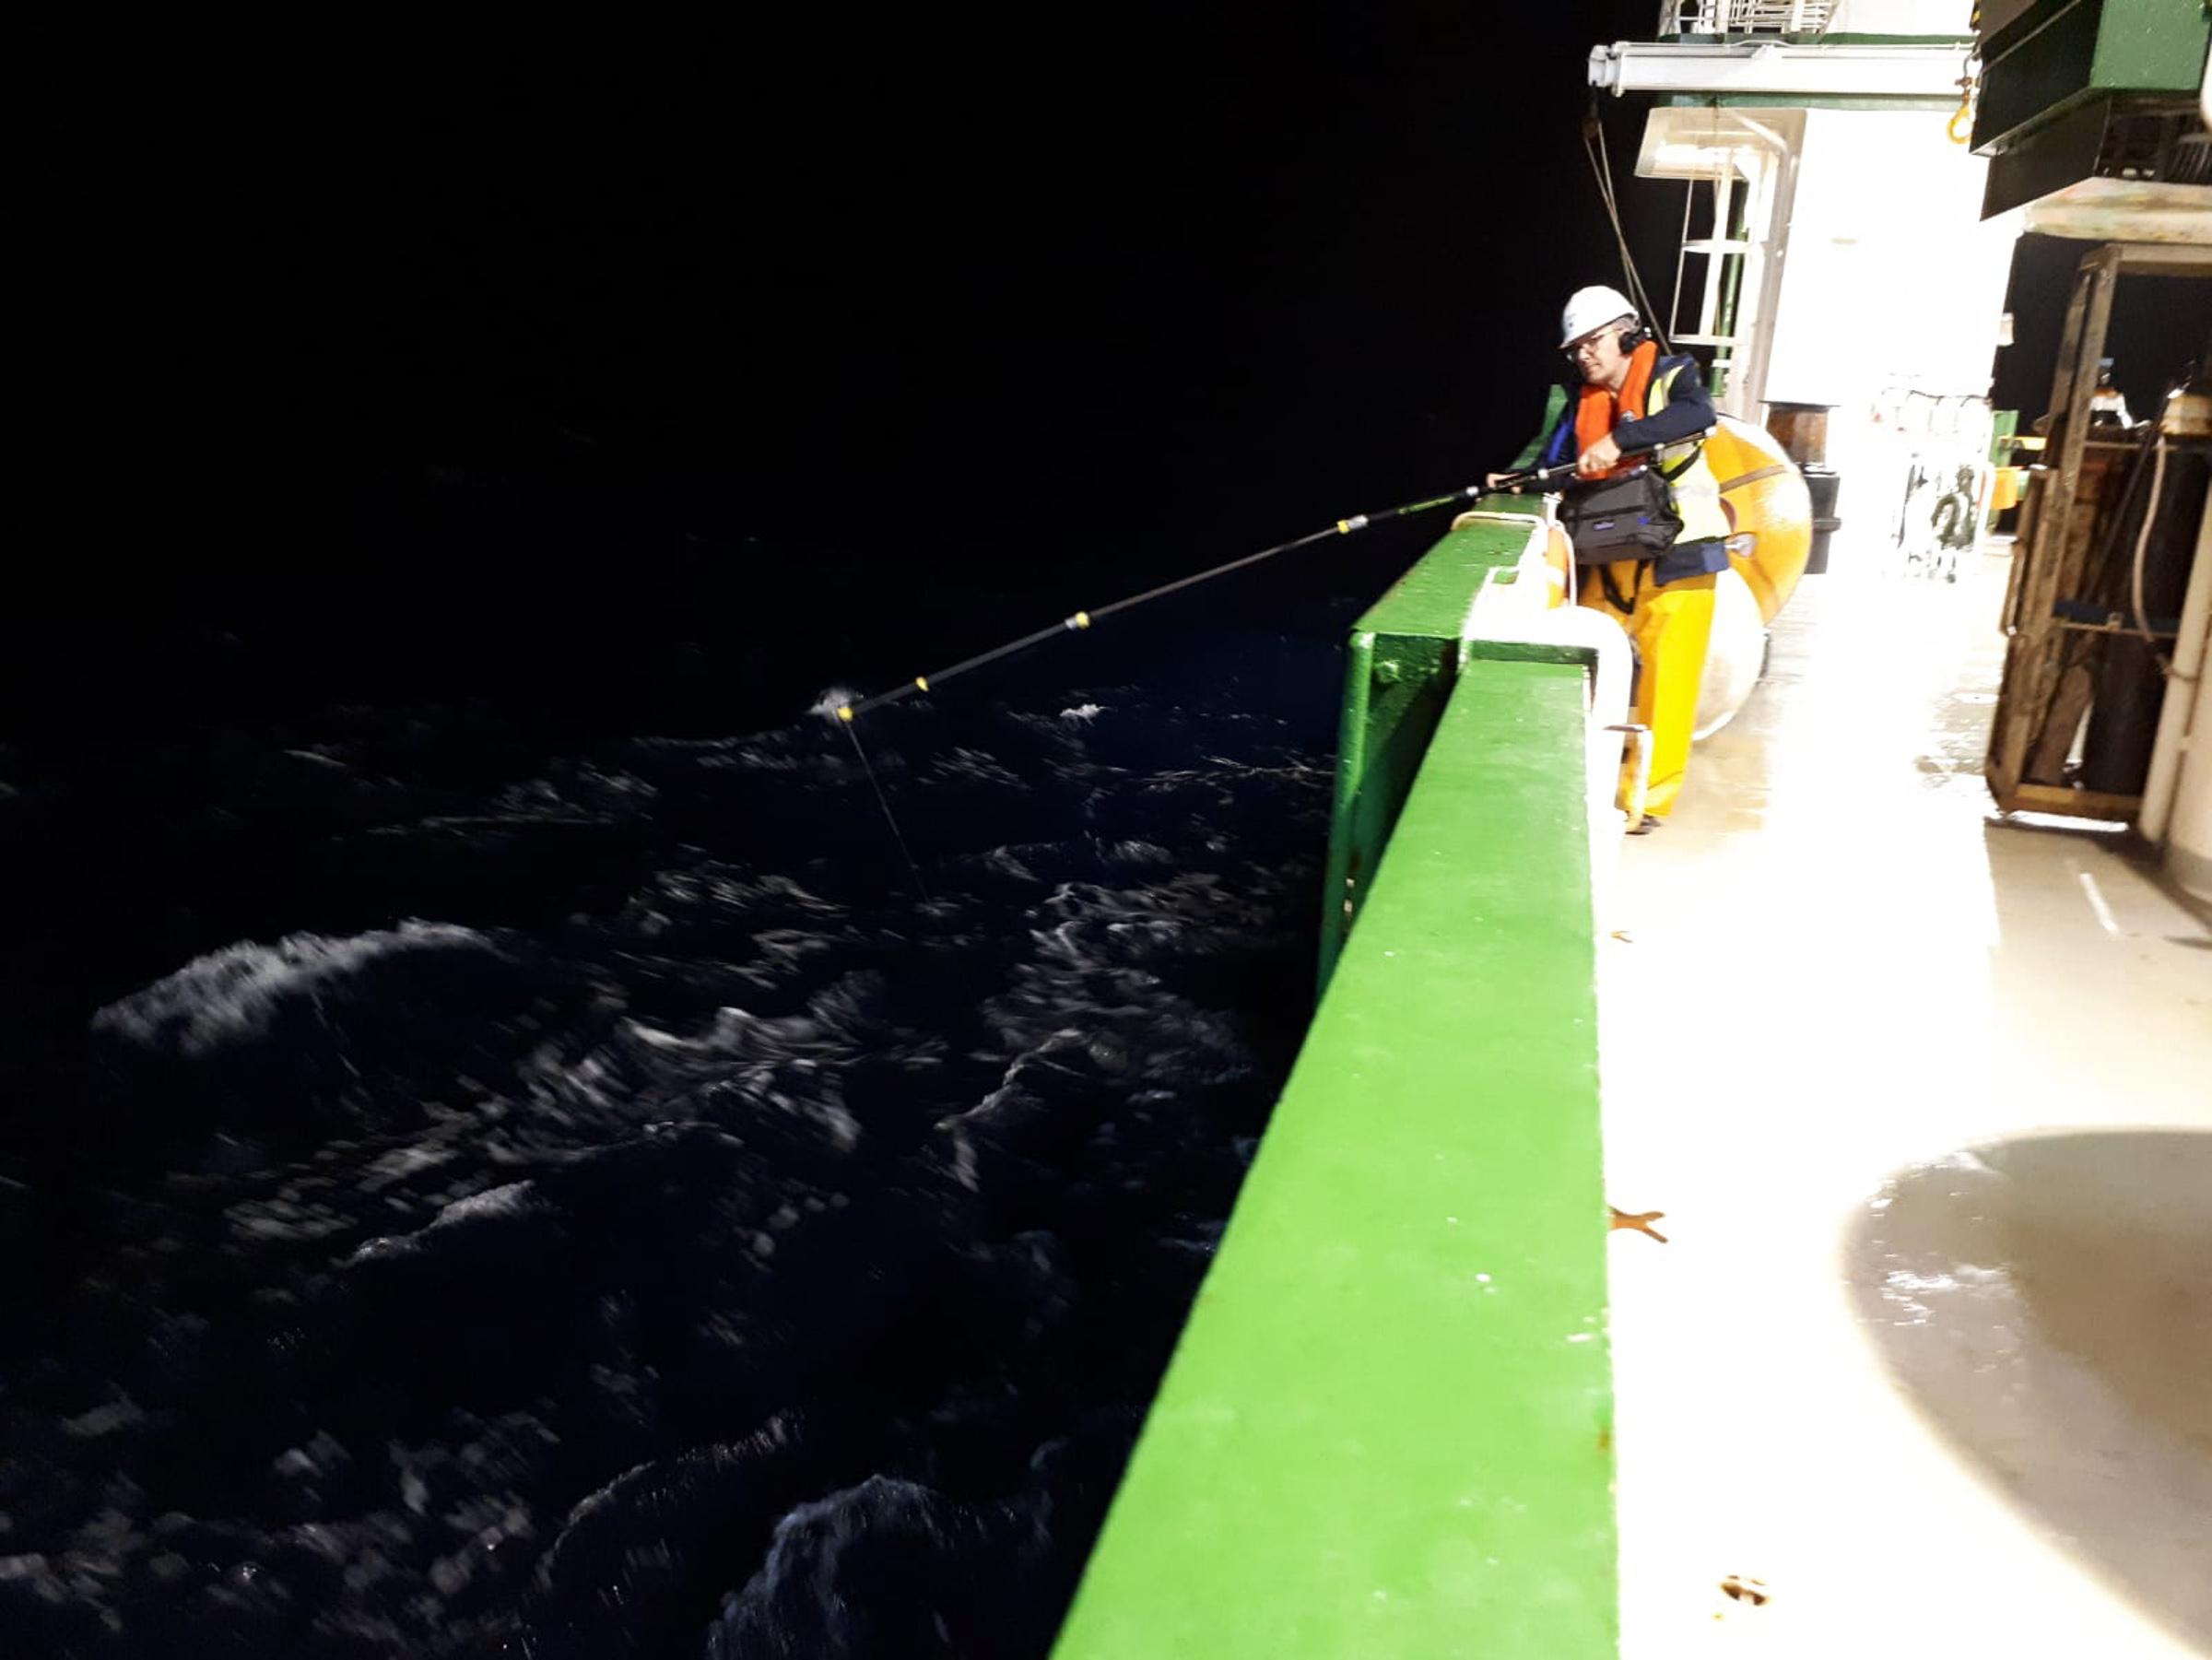 1. David Stalling Aerial Sparks_ RV Celtic Explorer 2018_Nightly underwater sound recording. Image by Sergei Lebedev.jpg